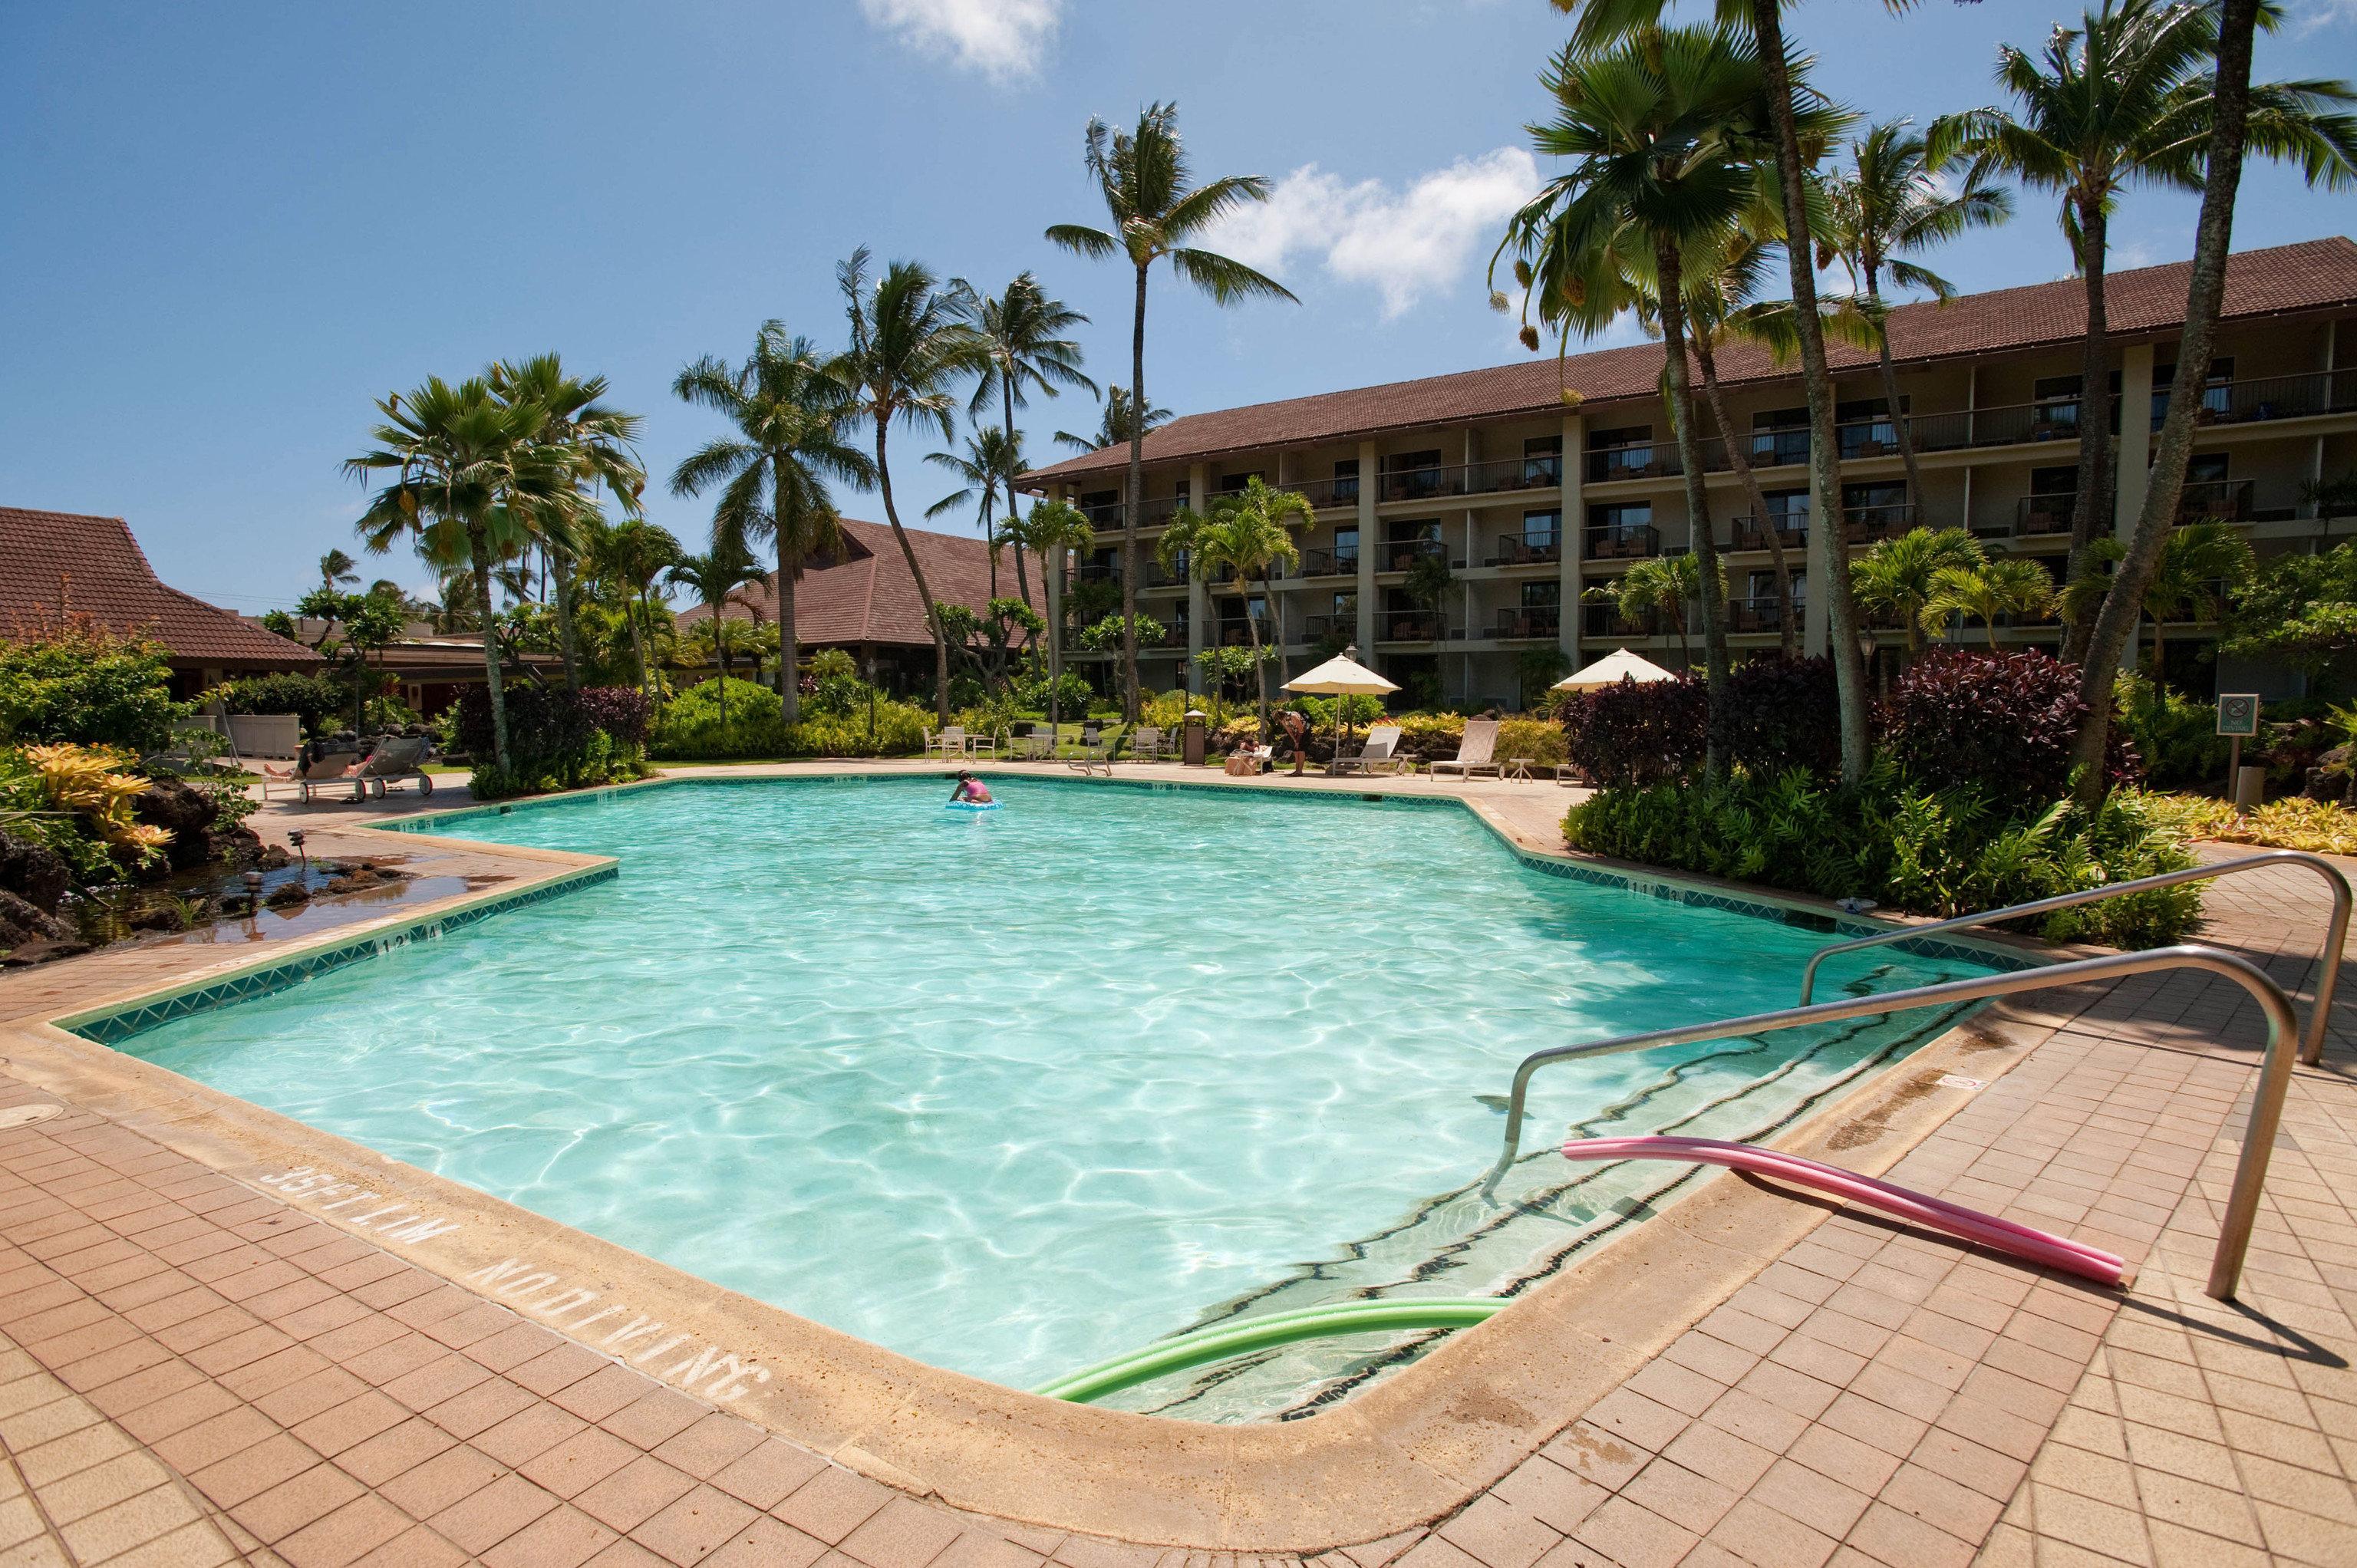 sky tree swimming pool property Resort leisure Pool Villa condominium backyard mansion Deck swimming